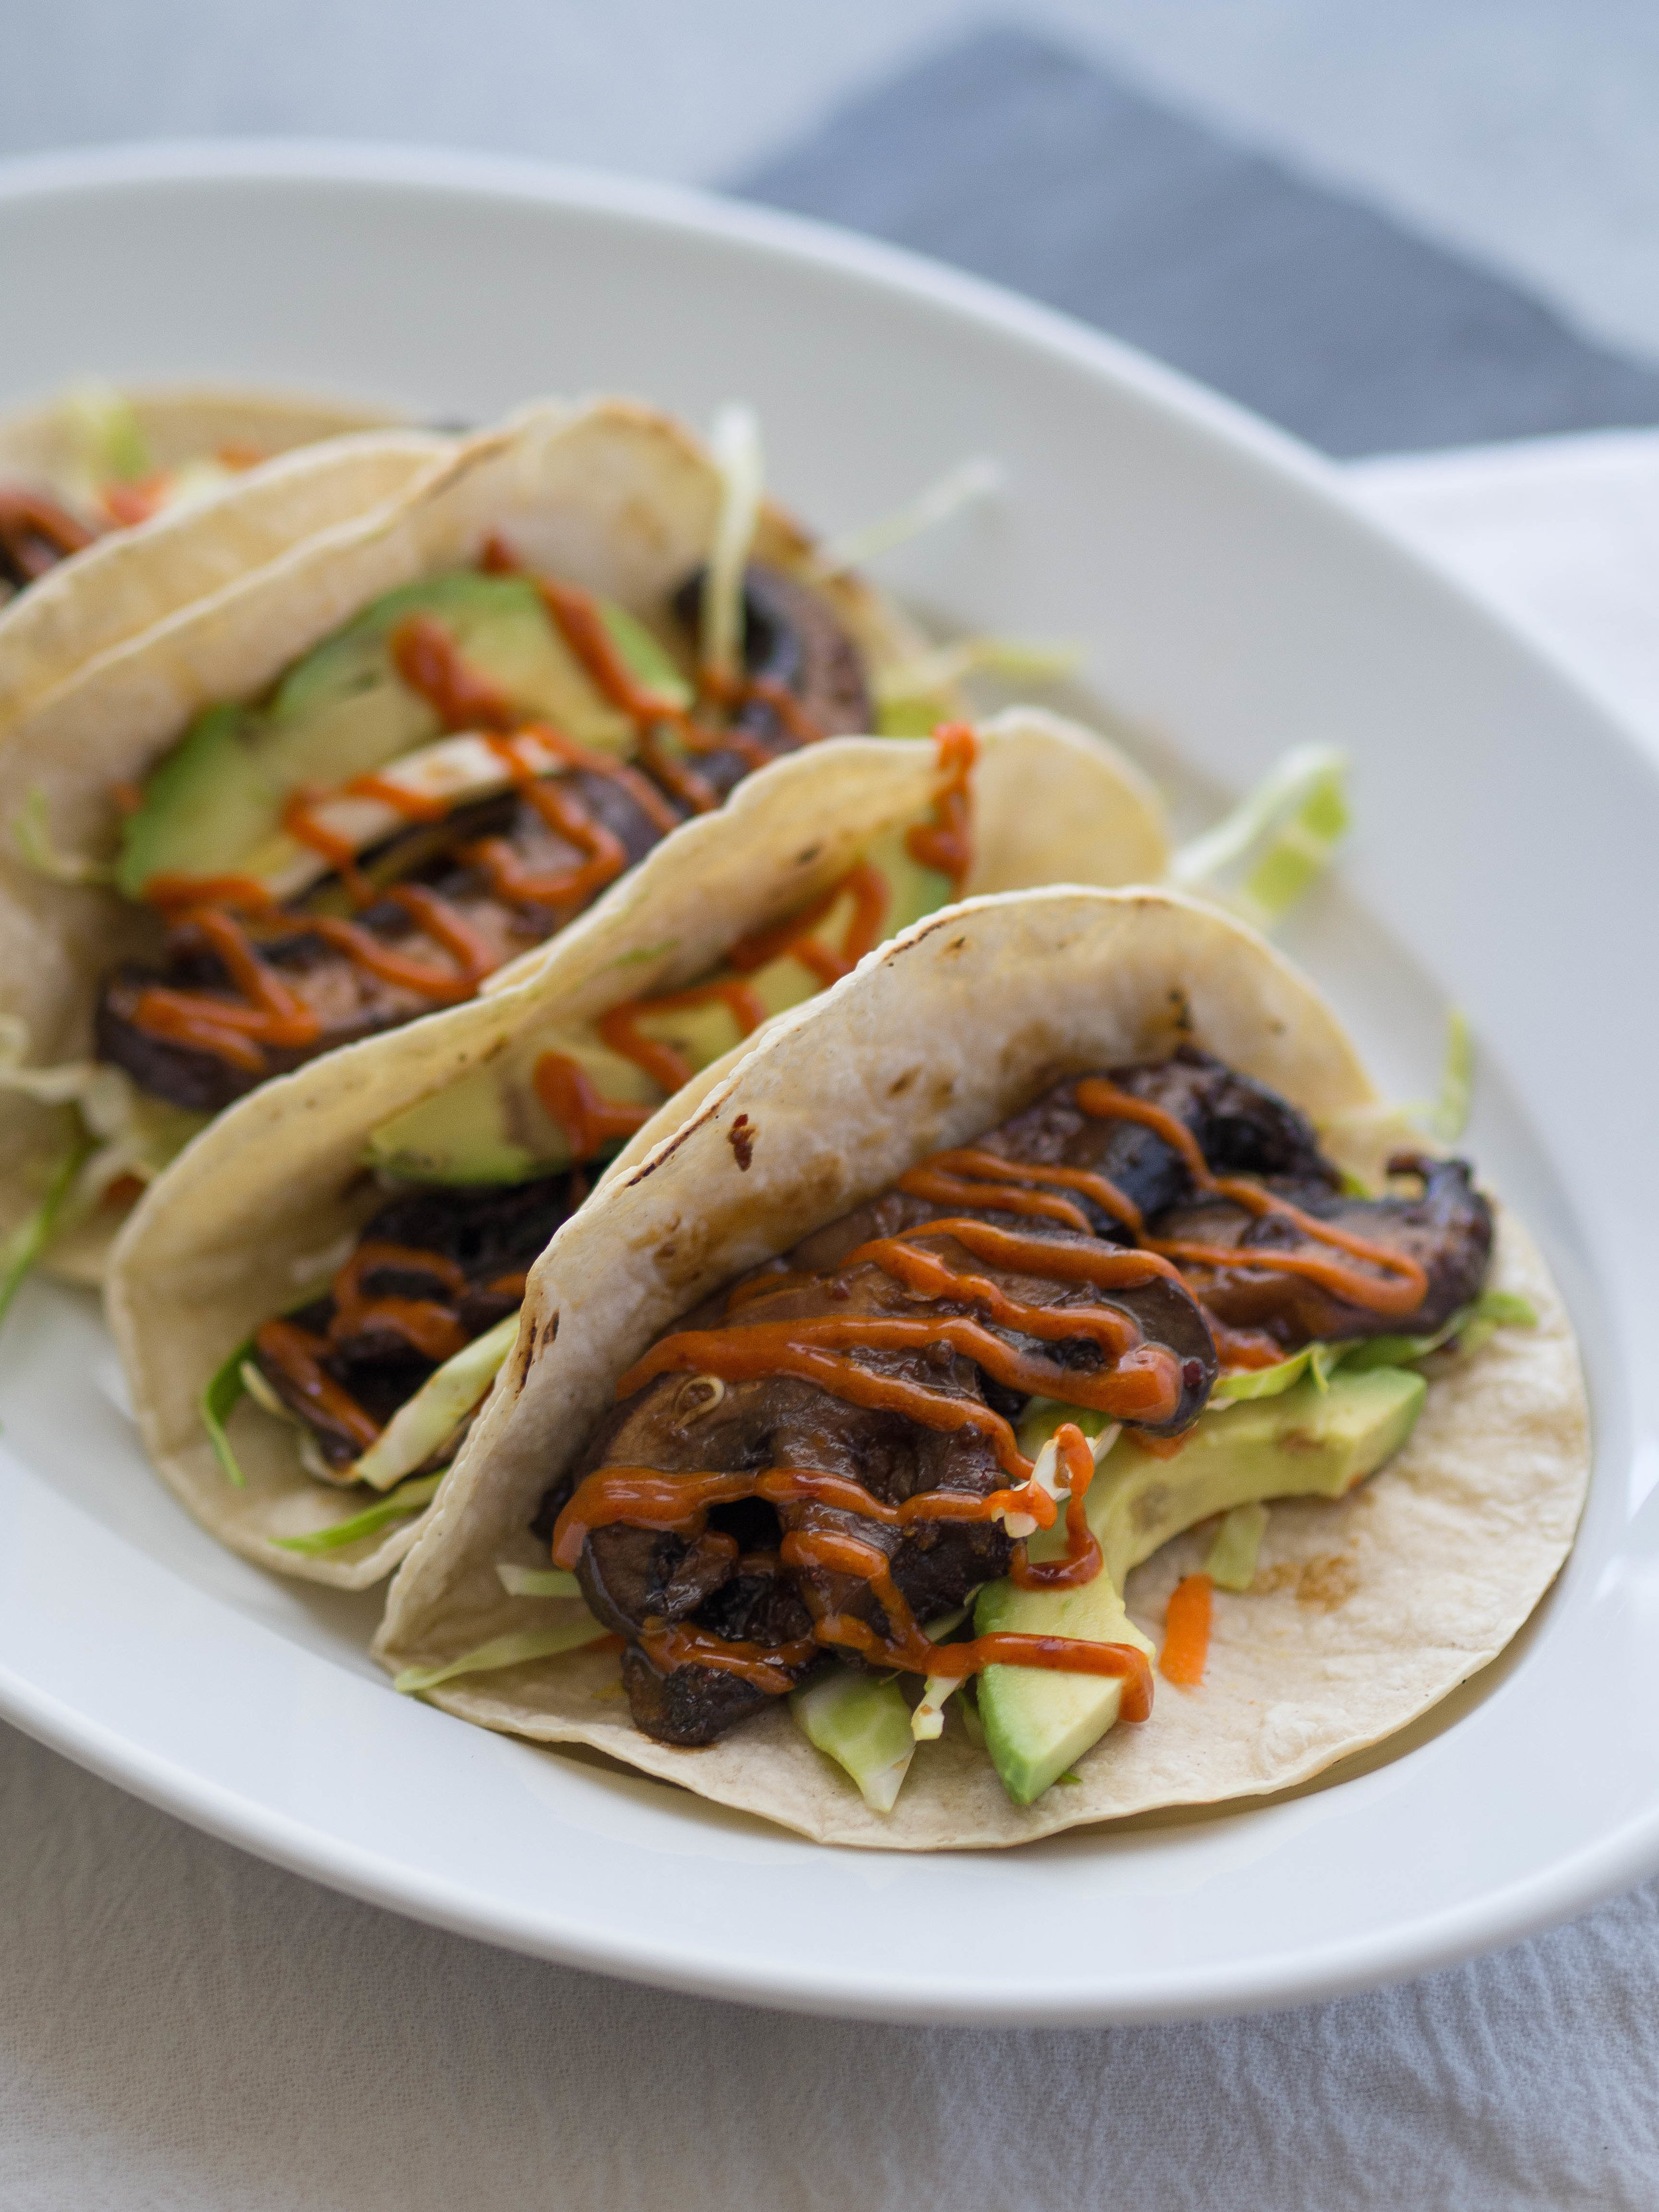 A vegan take on bulgogi tacos! These bulgogi portobello tacos are filled with avocado and a spicy gochujang mayo! #vegan #vegetarian #taco #bulgogi #mushroom #avocado #healthyrecipe